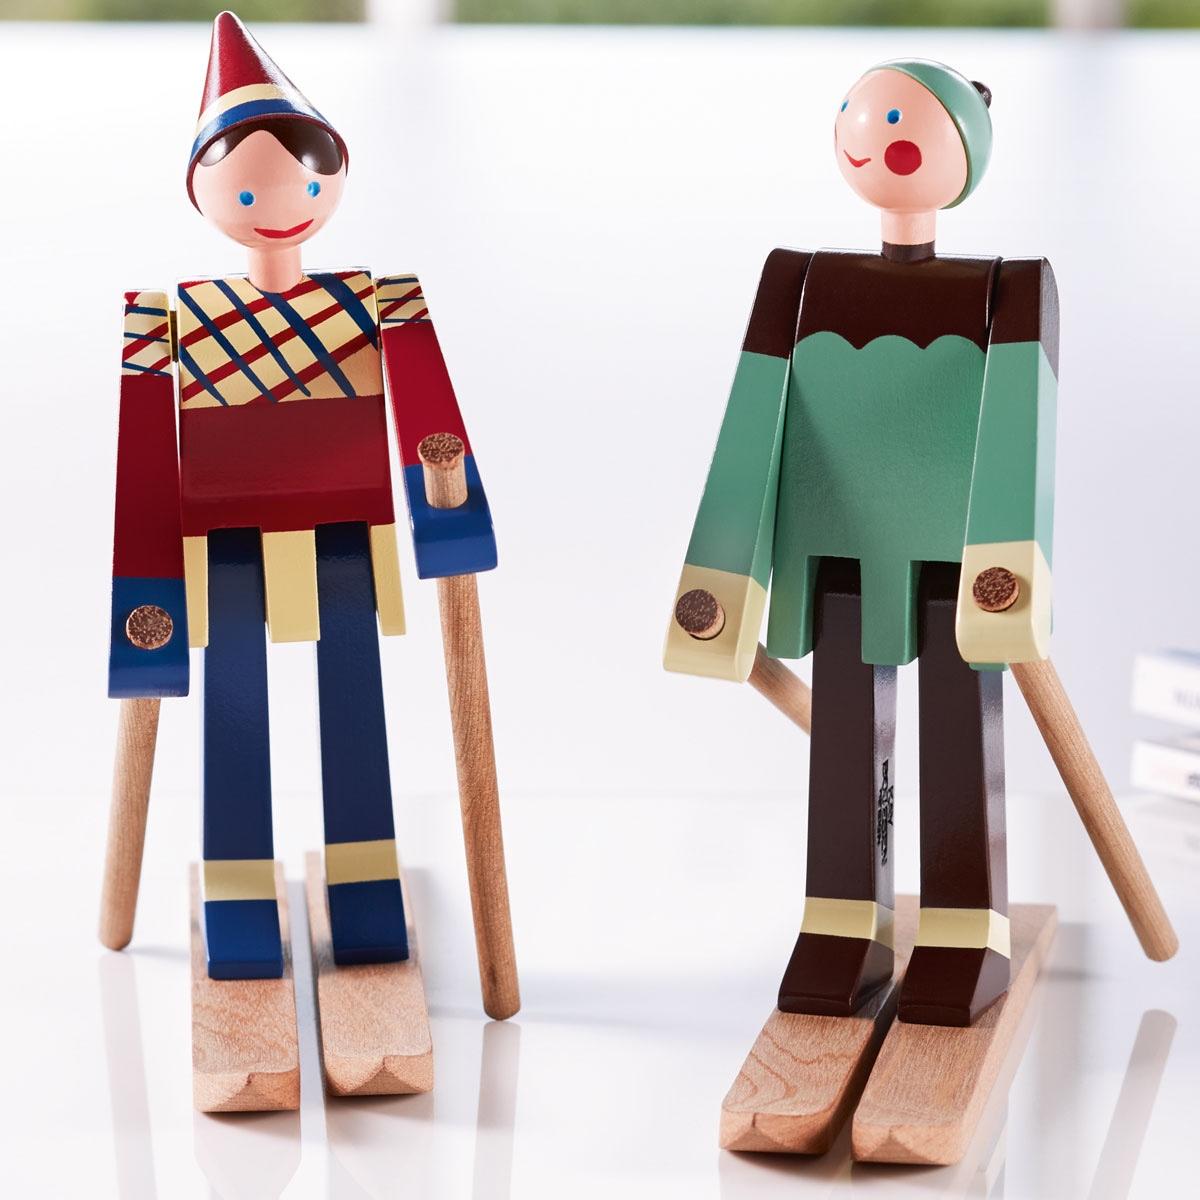 Datti and Boje, the skiers. Image© Kay Bojesen.